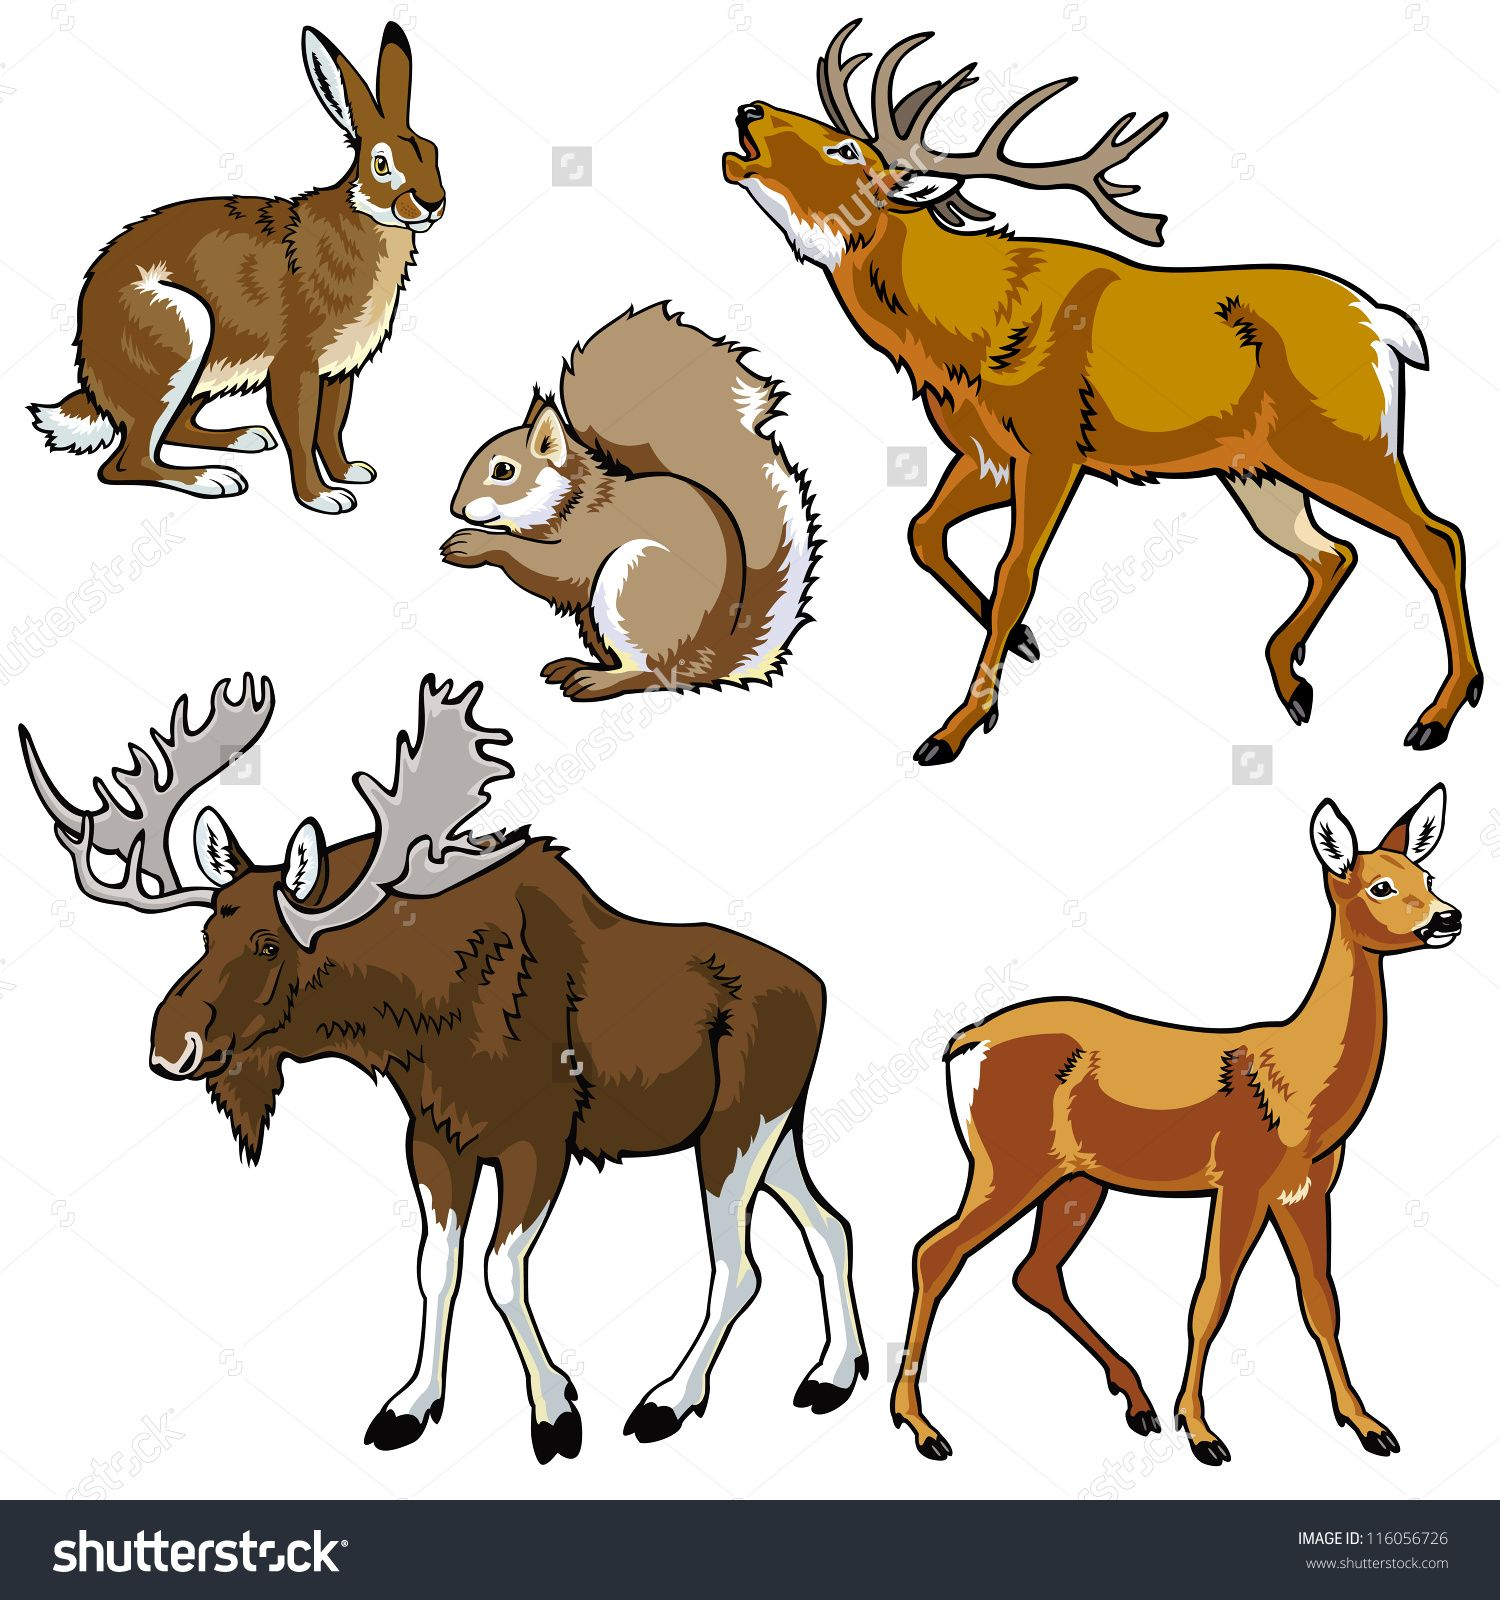 jungle animals serius illustrations Google Search